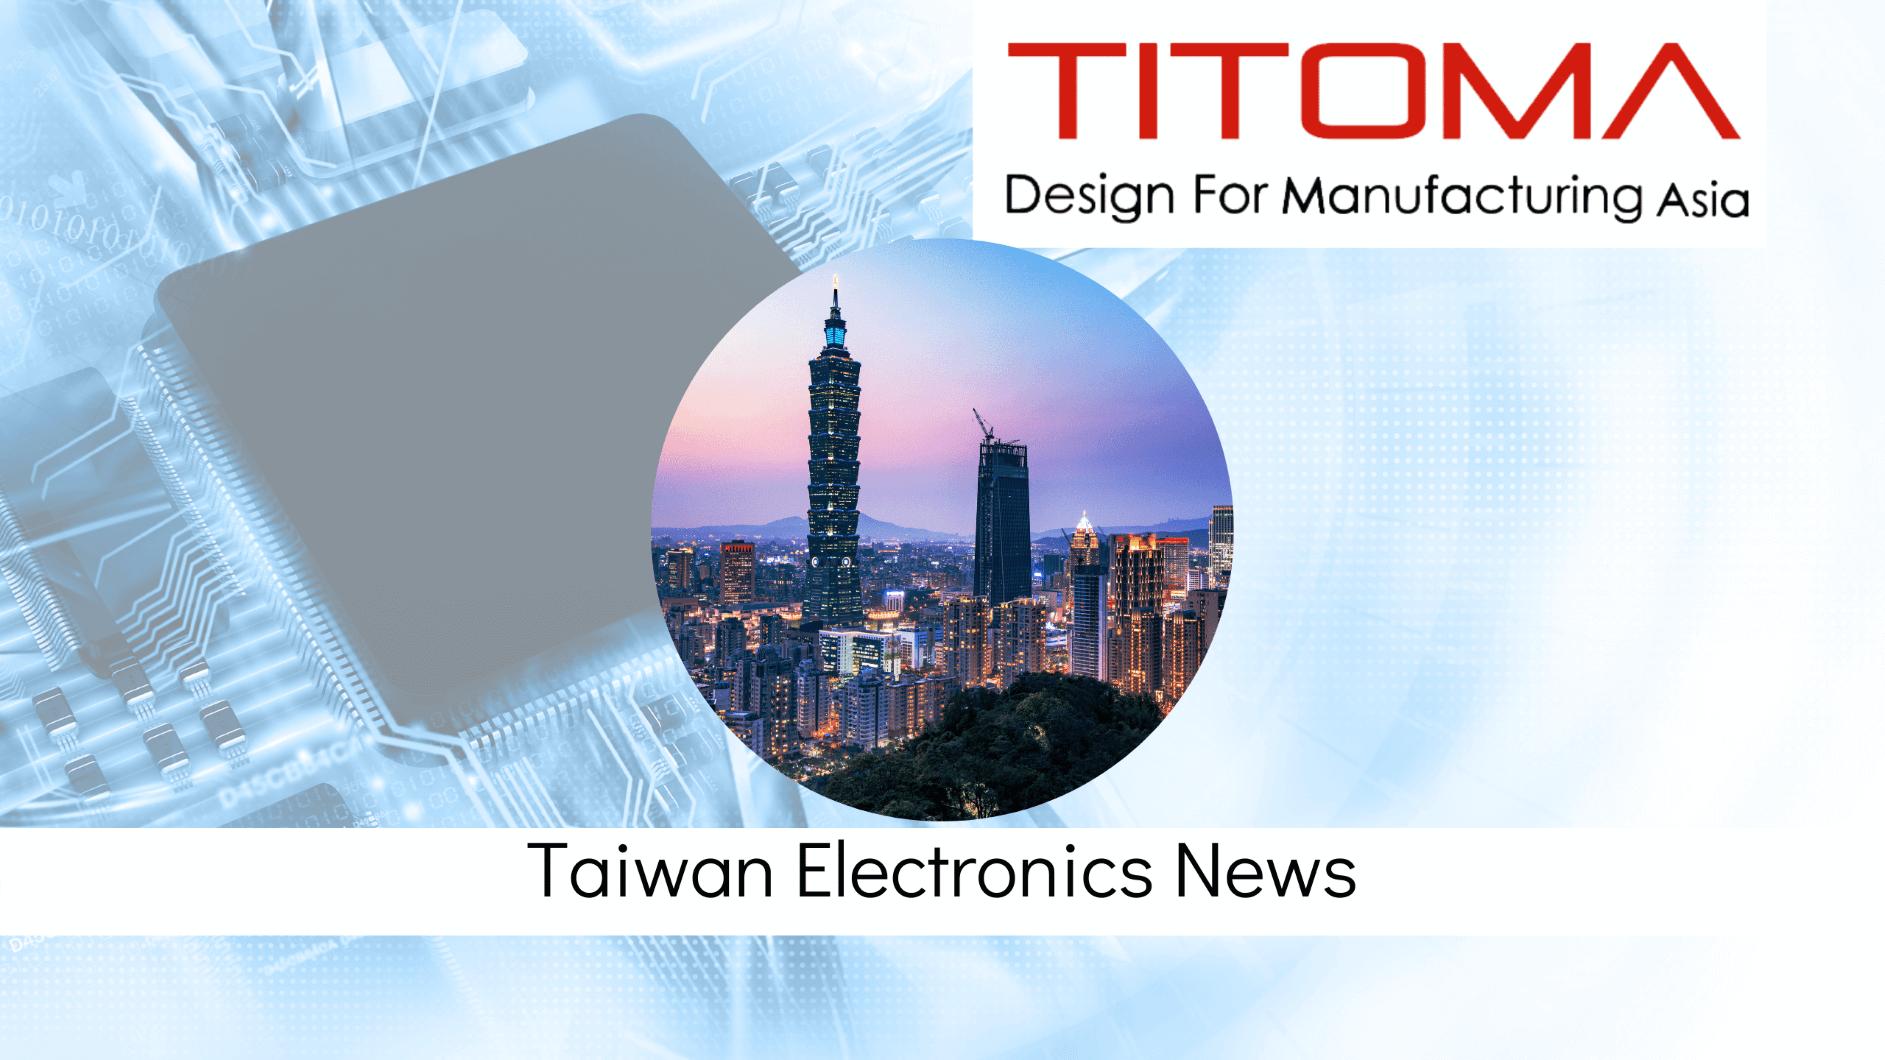 Taiwan Electronics News Titoma